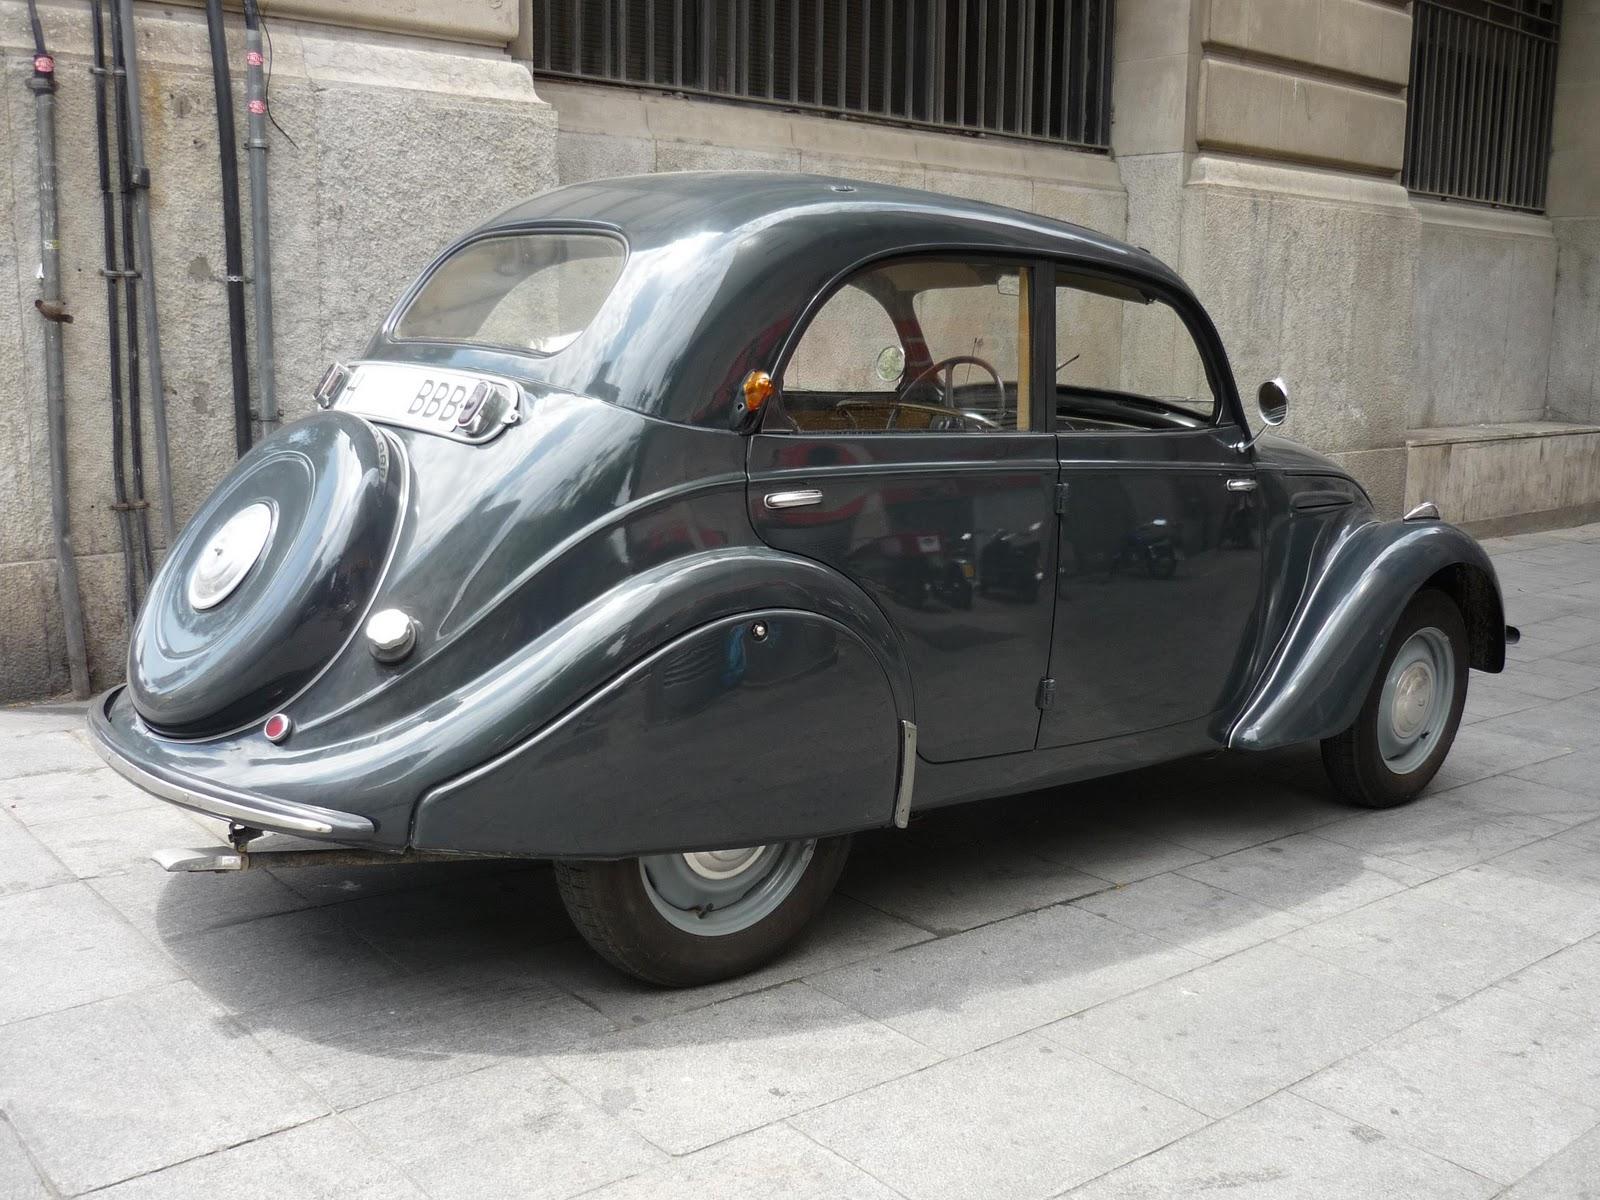 Amazing Vehicles For Rent: Peugeot 202 (1948